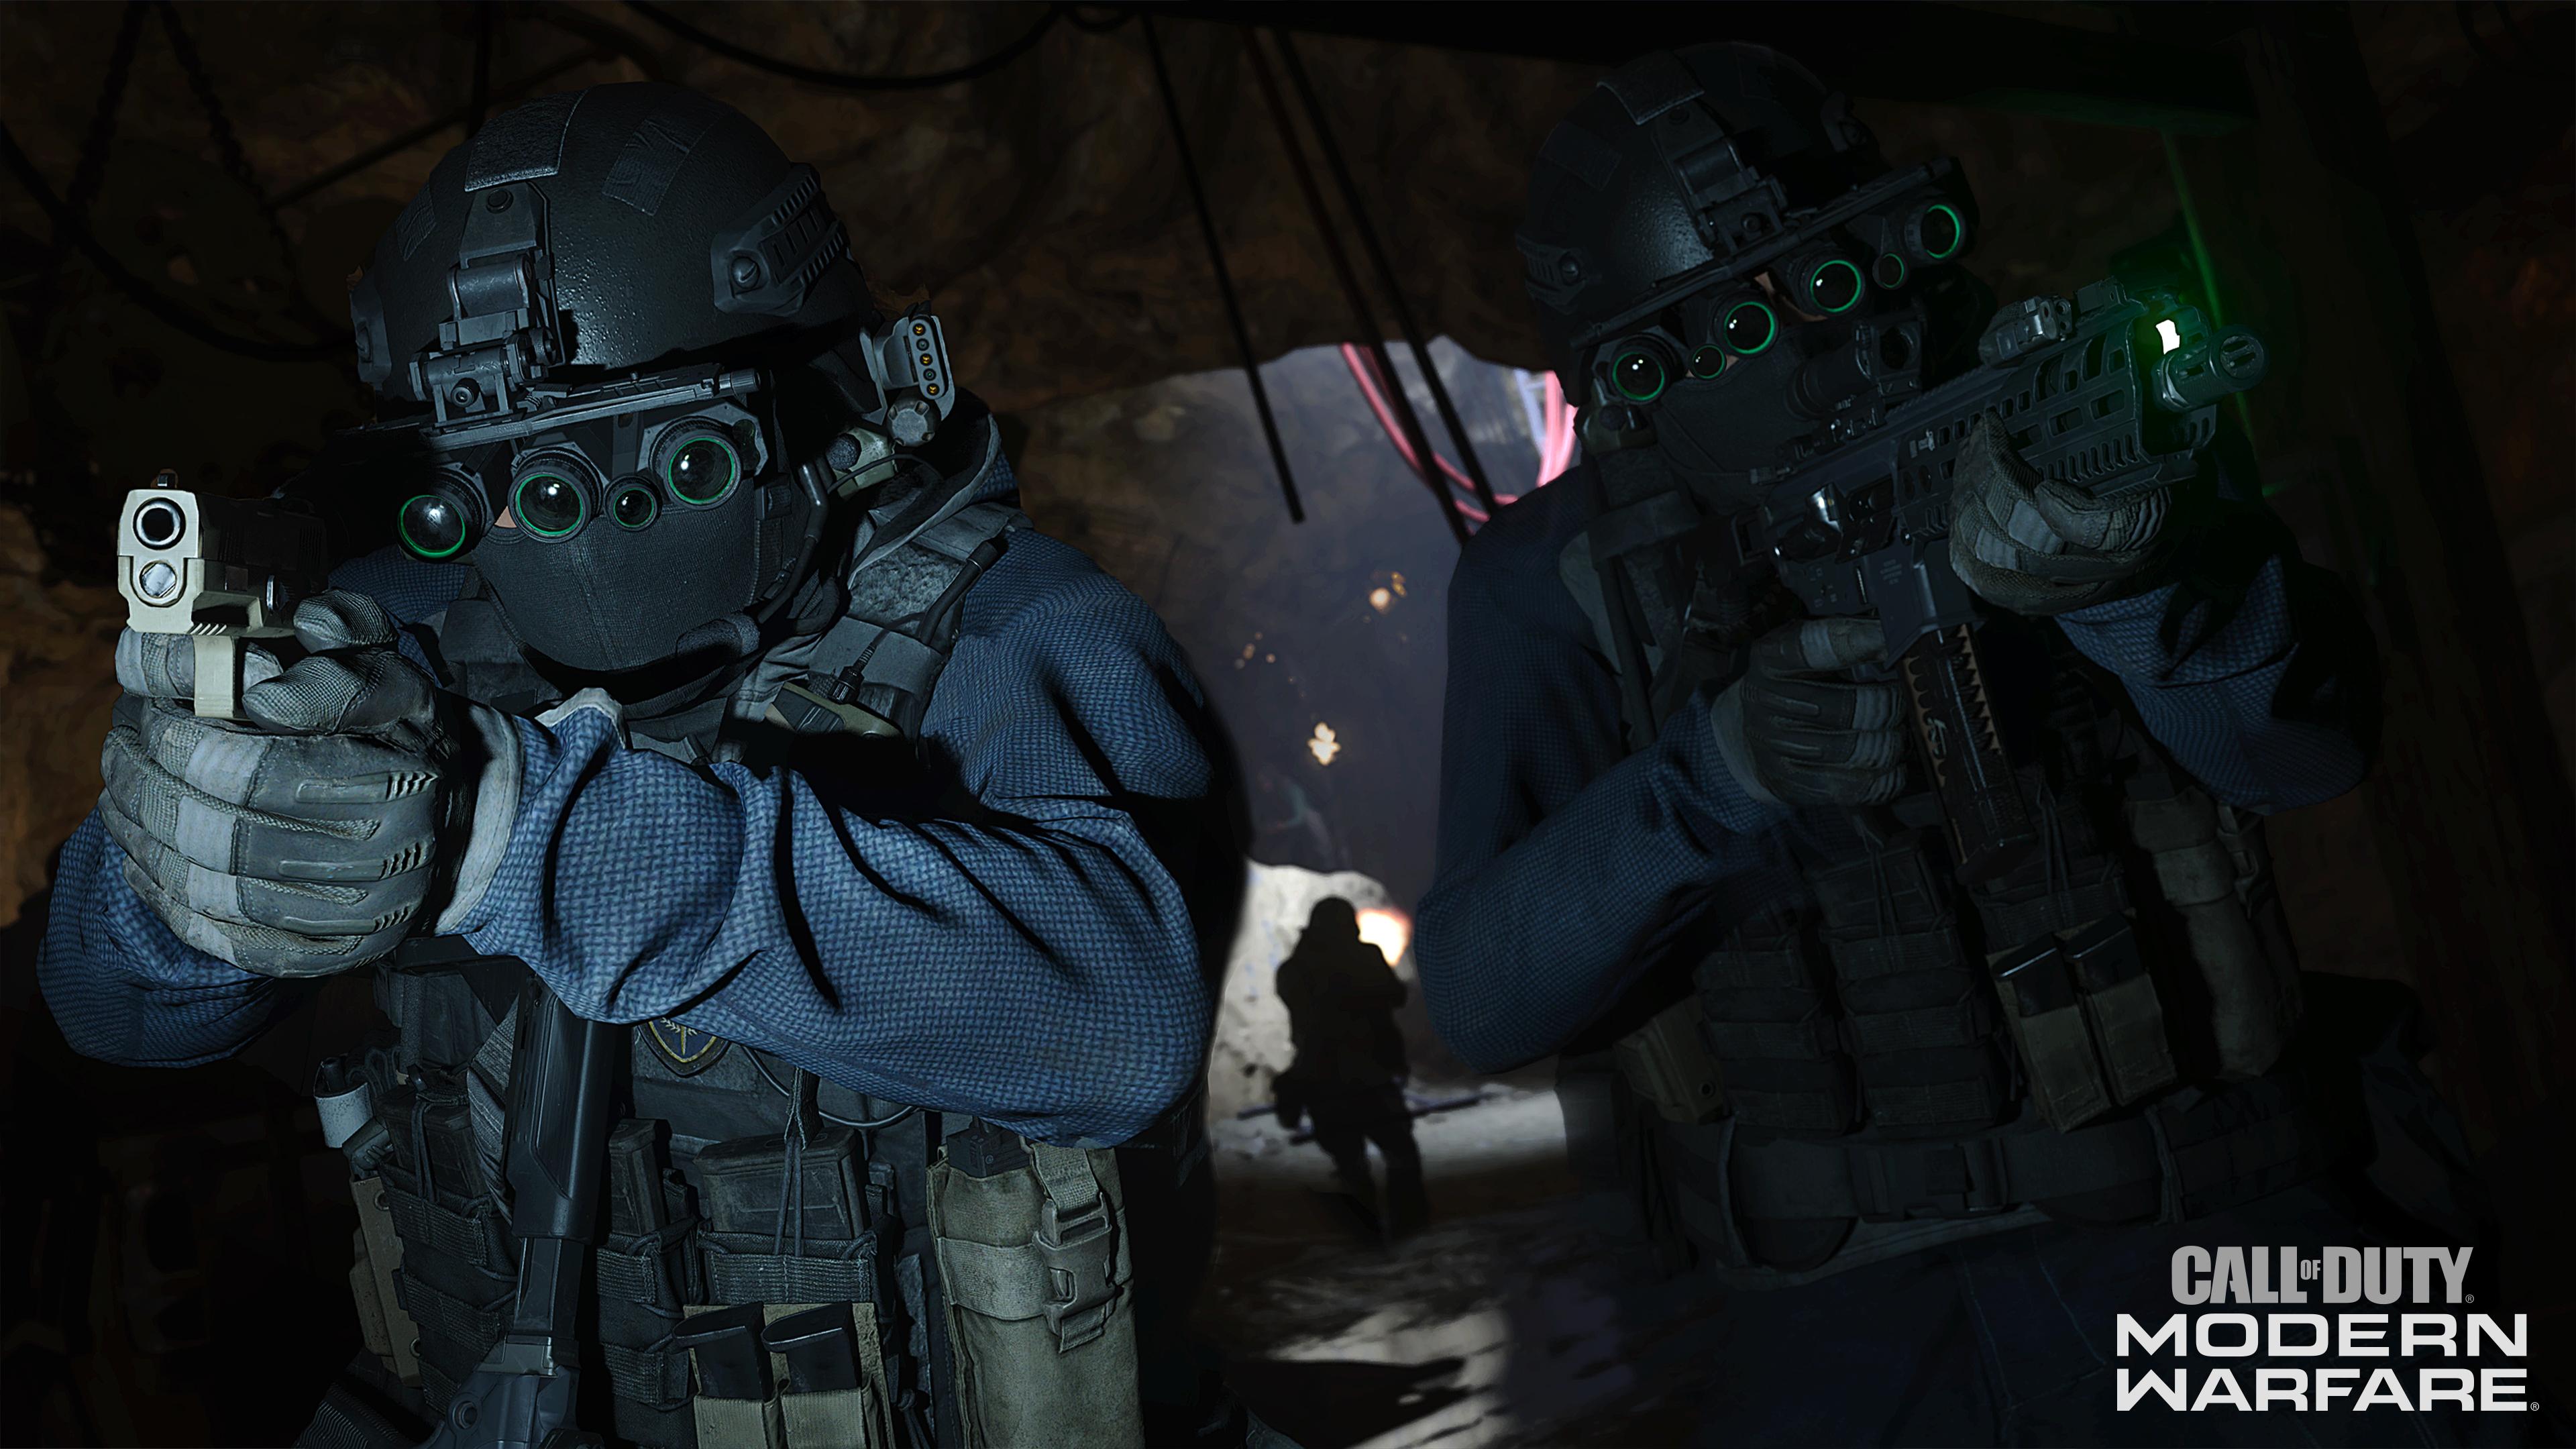 Get Ready for Call of Duty Modern Warfare PC Launch Trailer 3840x2160